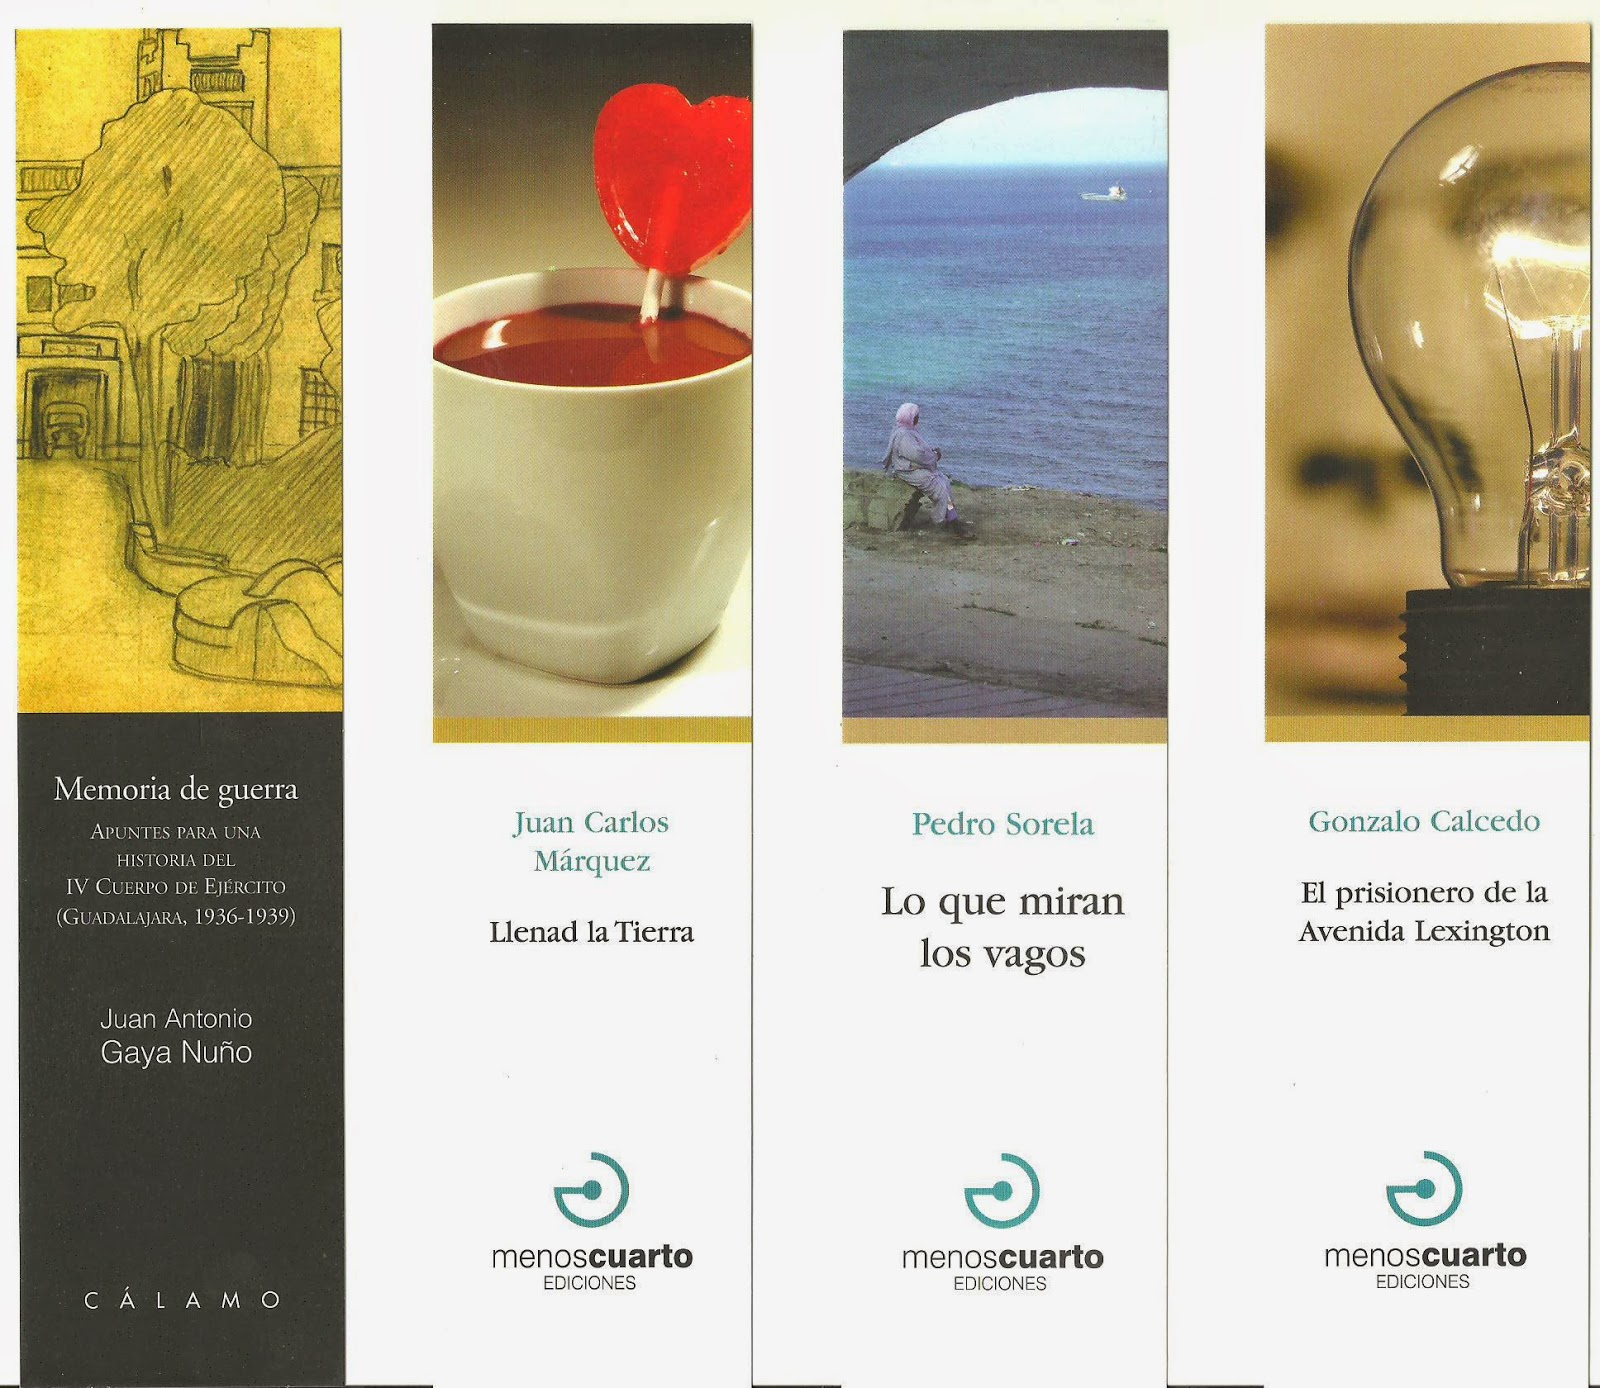 els punts de llibre: EDITORIAL MENOS CUARTO 2015